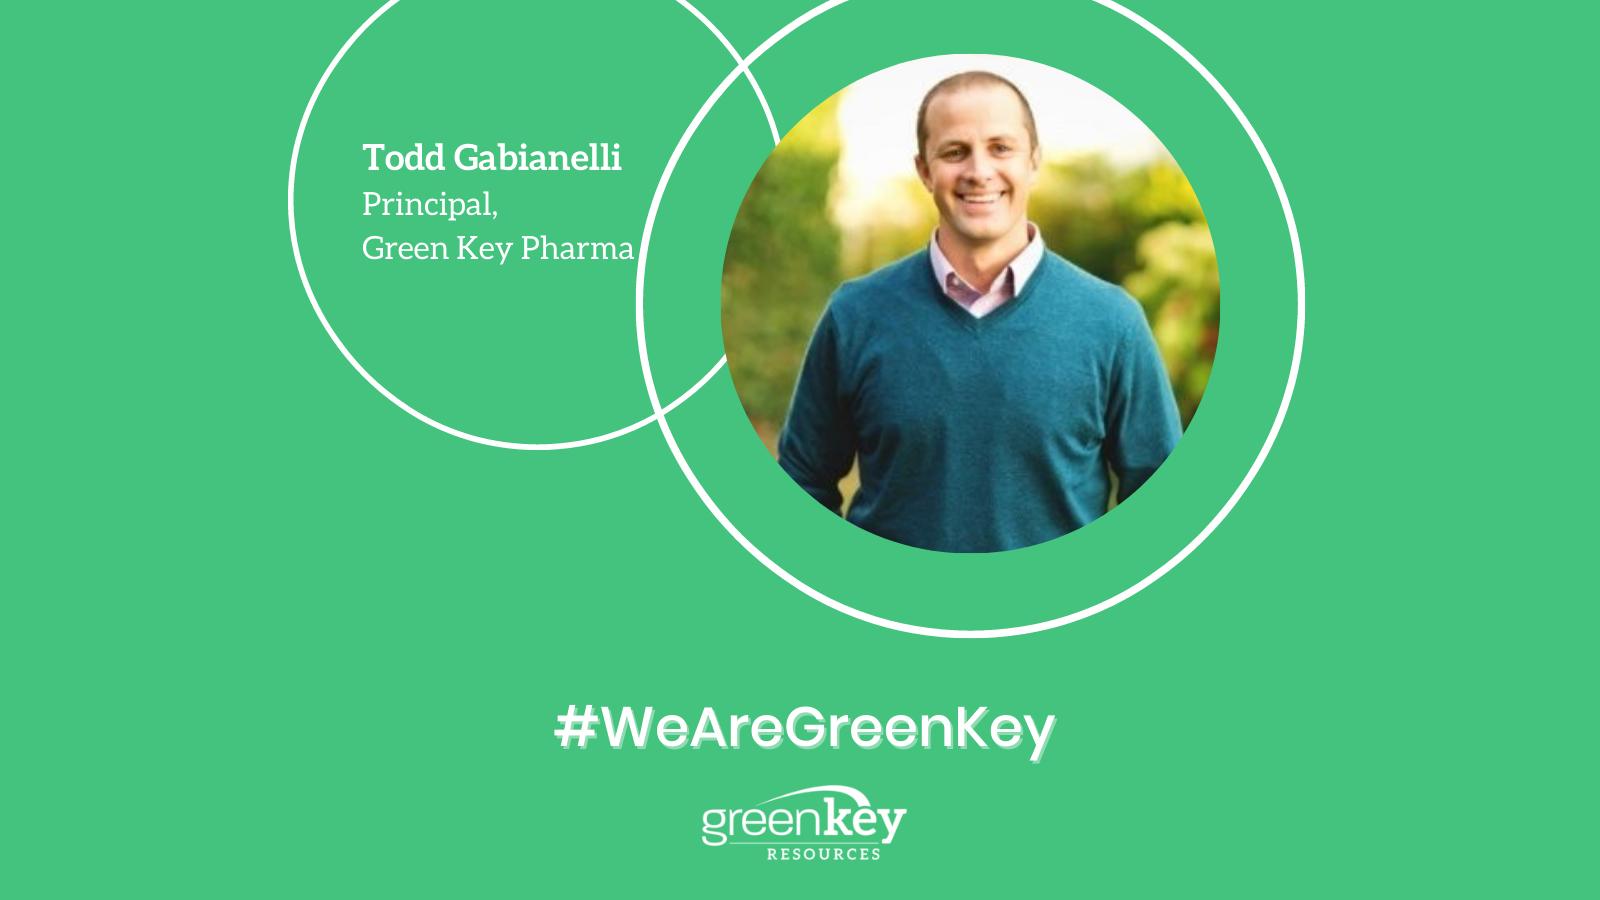 Todd Gabianelli - Principal - Green Key Pharma